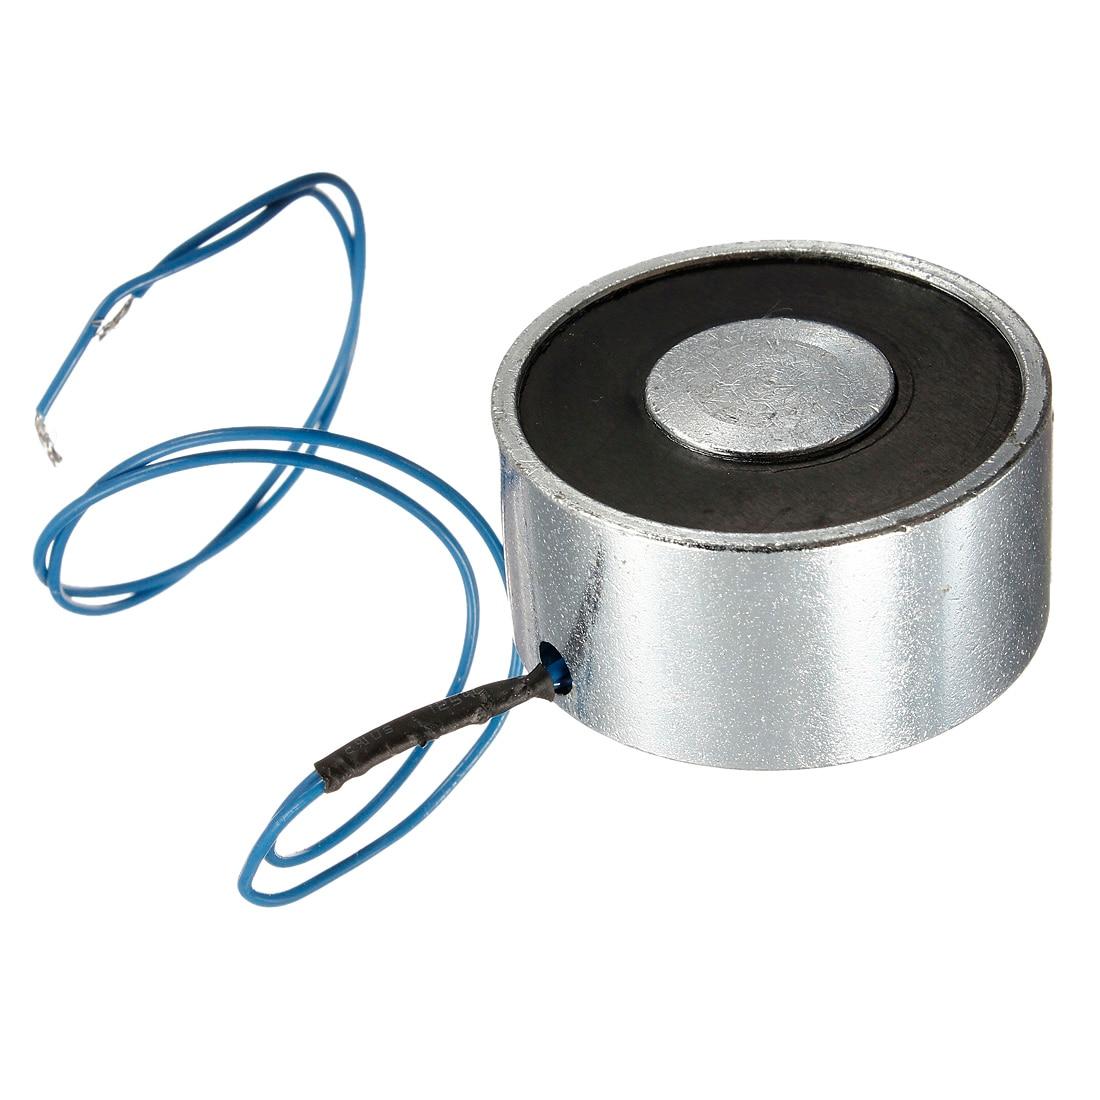 Nflc Yhn Dc12v Elektrische Hebe Magnet Halten Magnet-elektromagnet Fahrstuhl 8 W 25 Kg/55lbs Sanitär